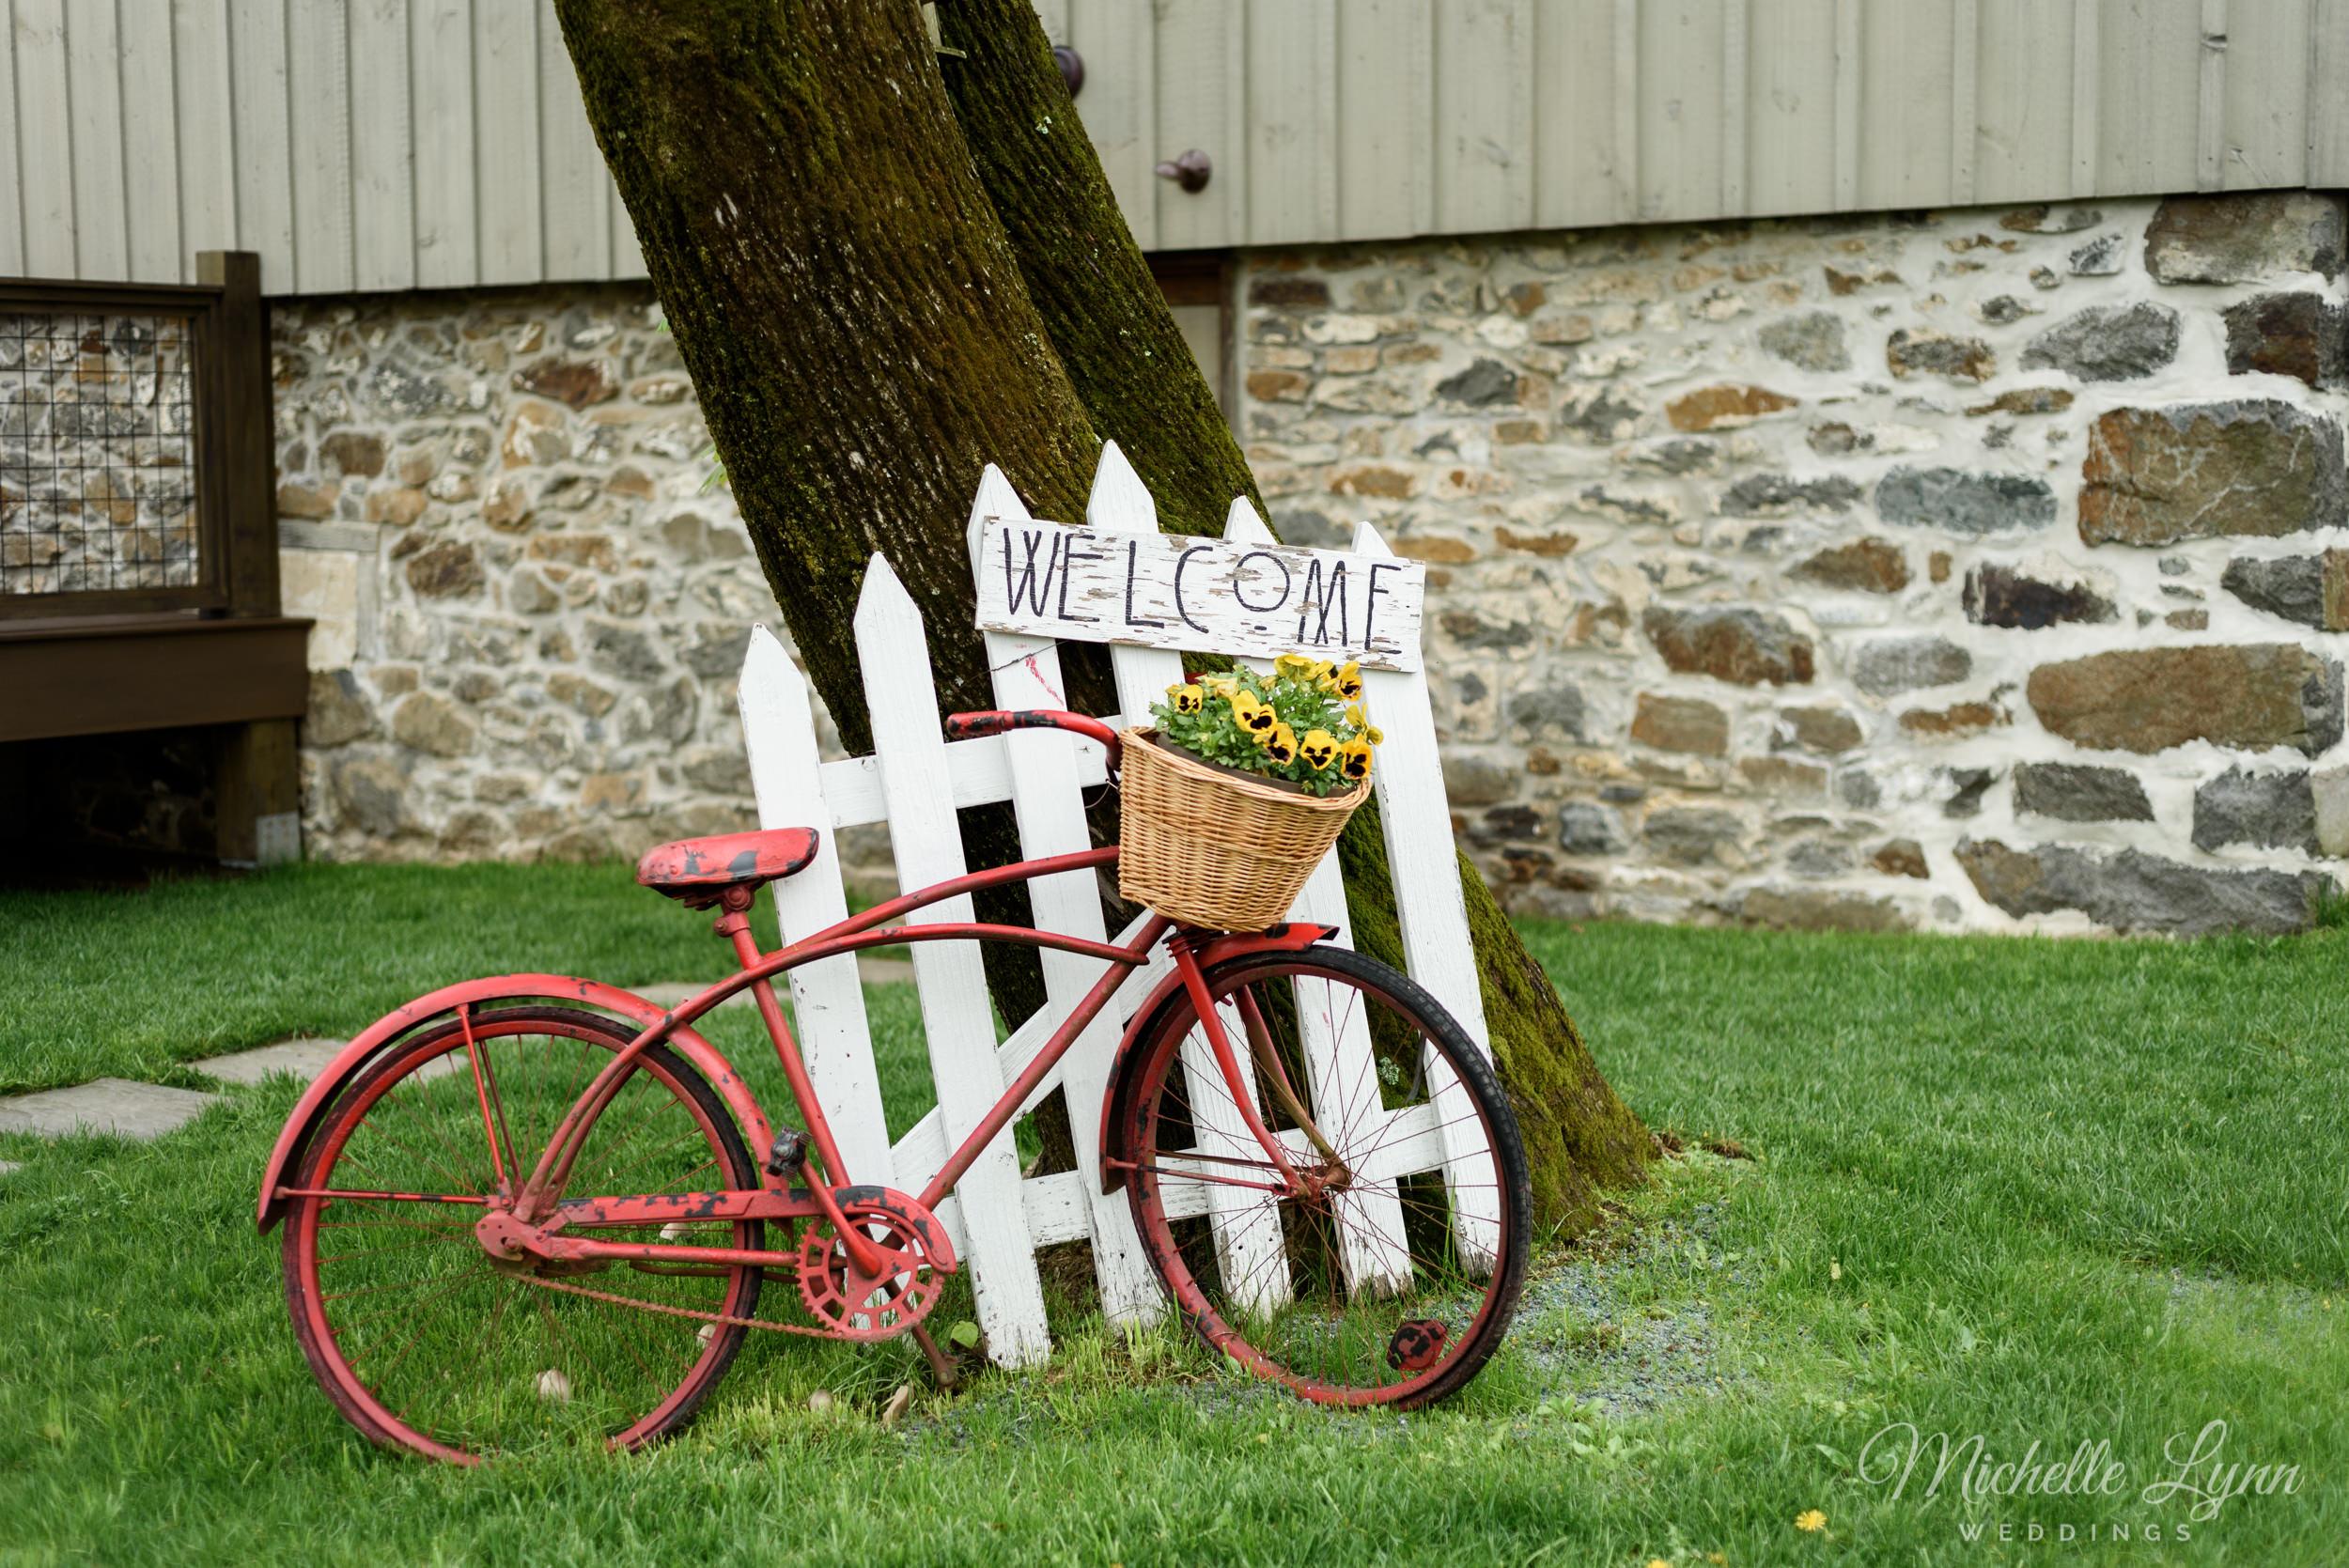 mlw-the-farm-bakery-and-events-wedding-photos-27.jpg